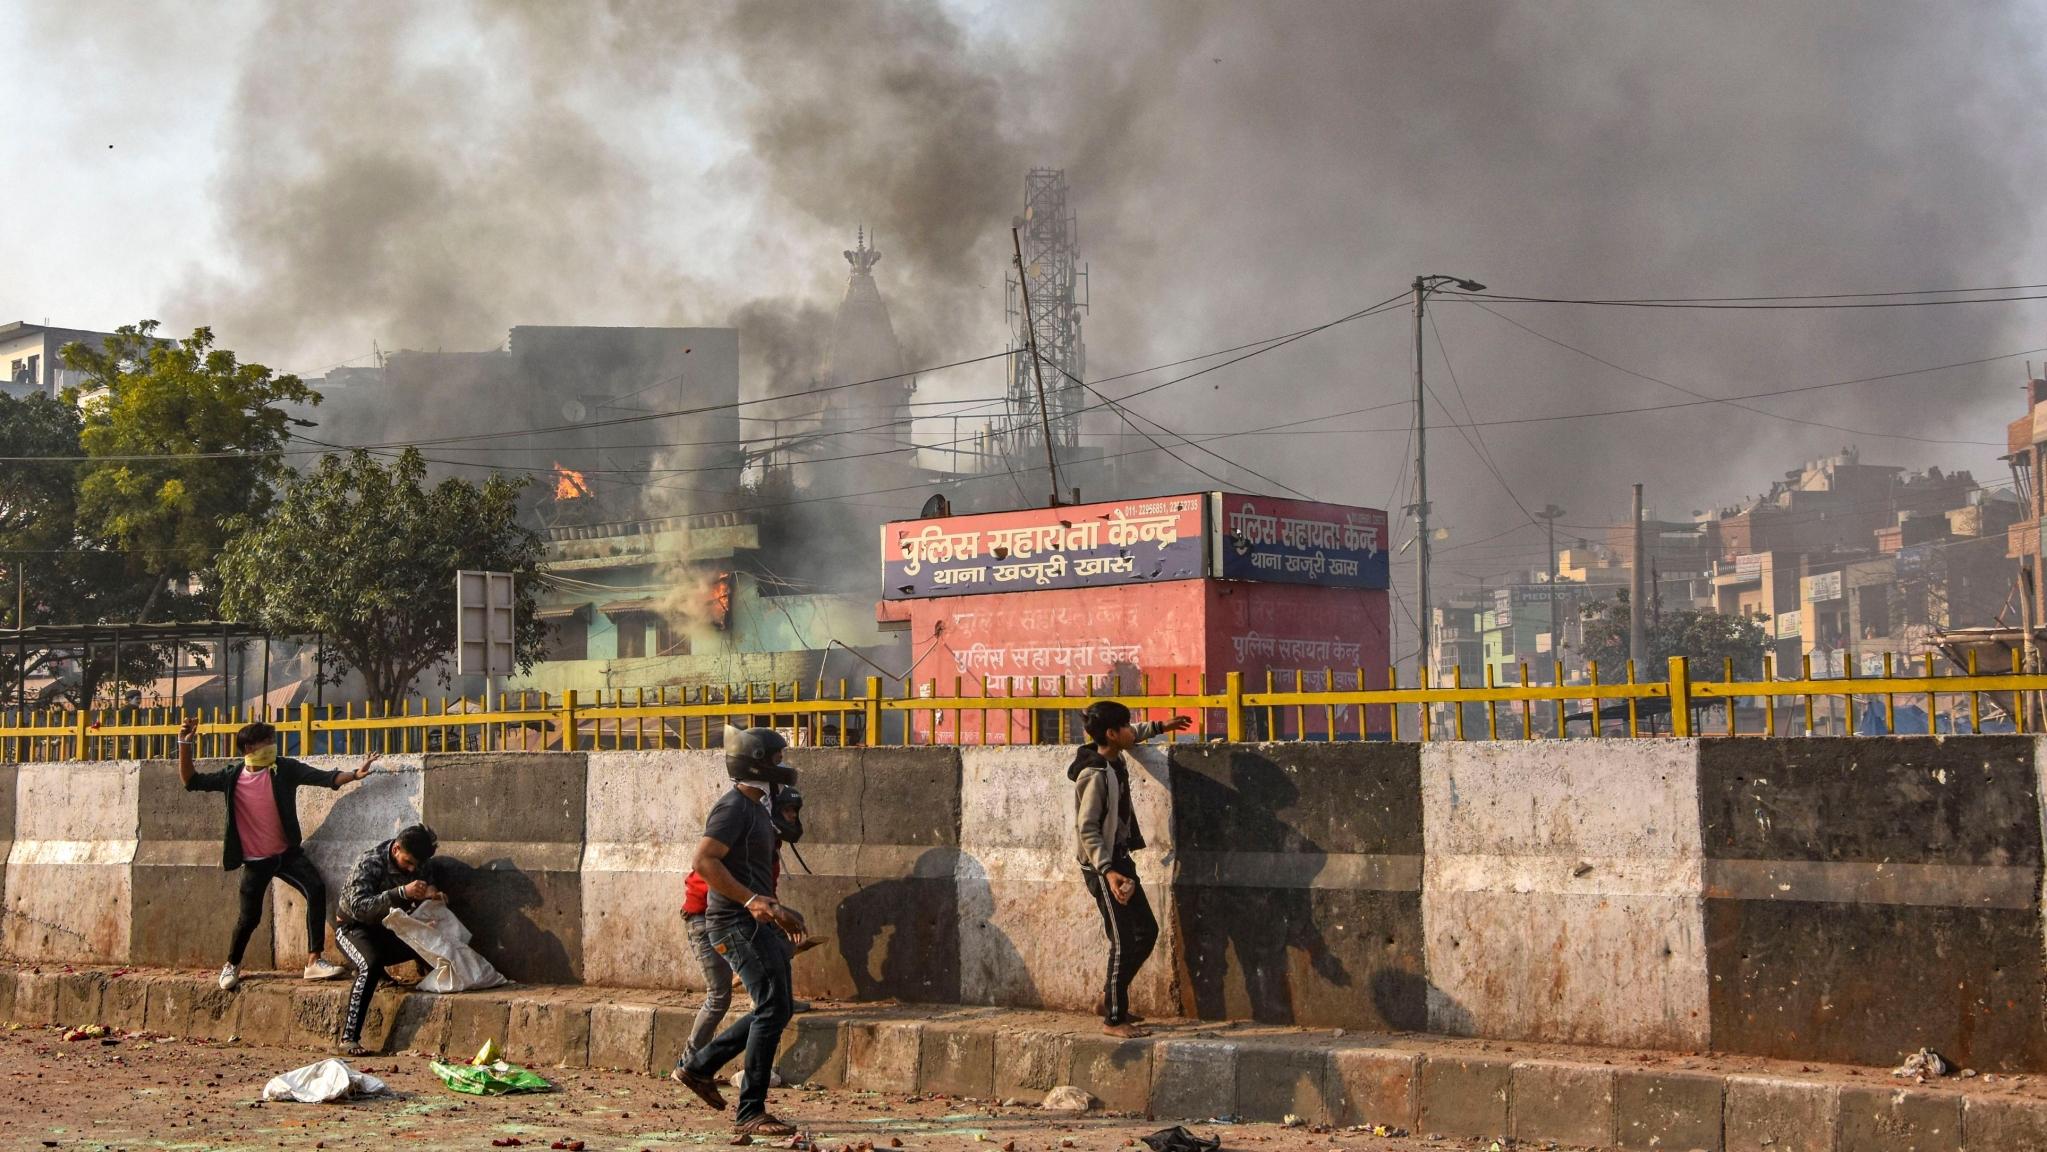 Communal Violence Spreads Across NE Delhi, Section 144 Imposed